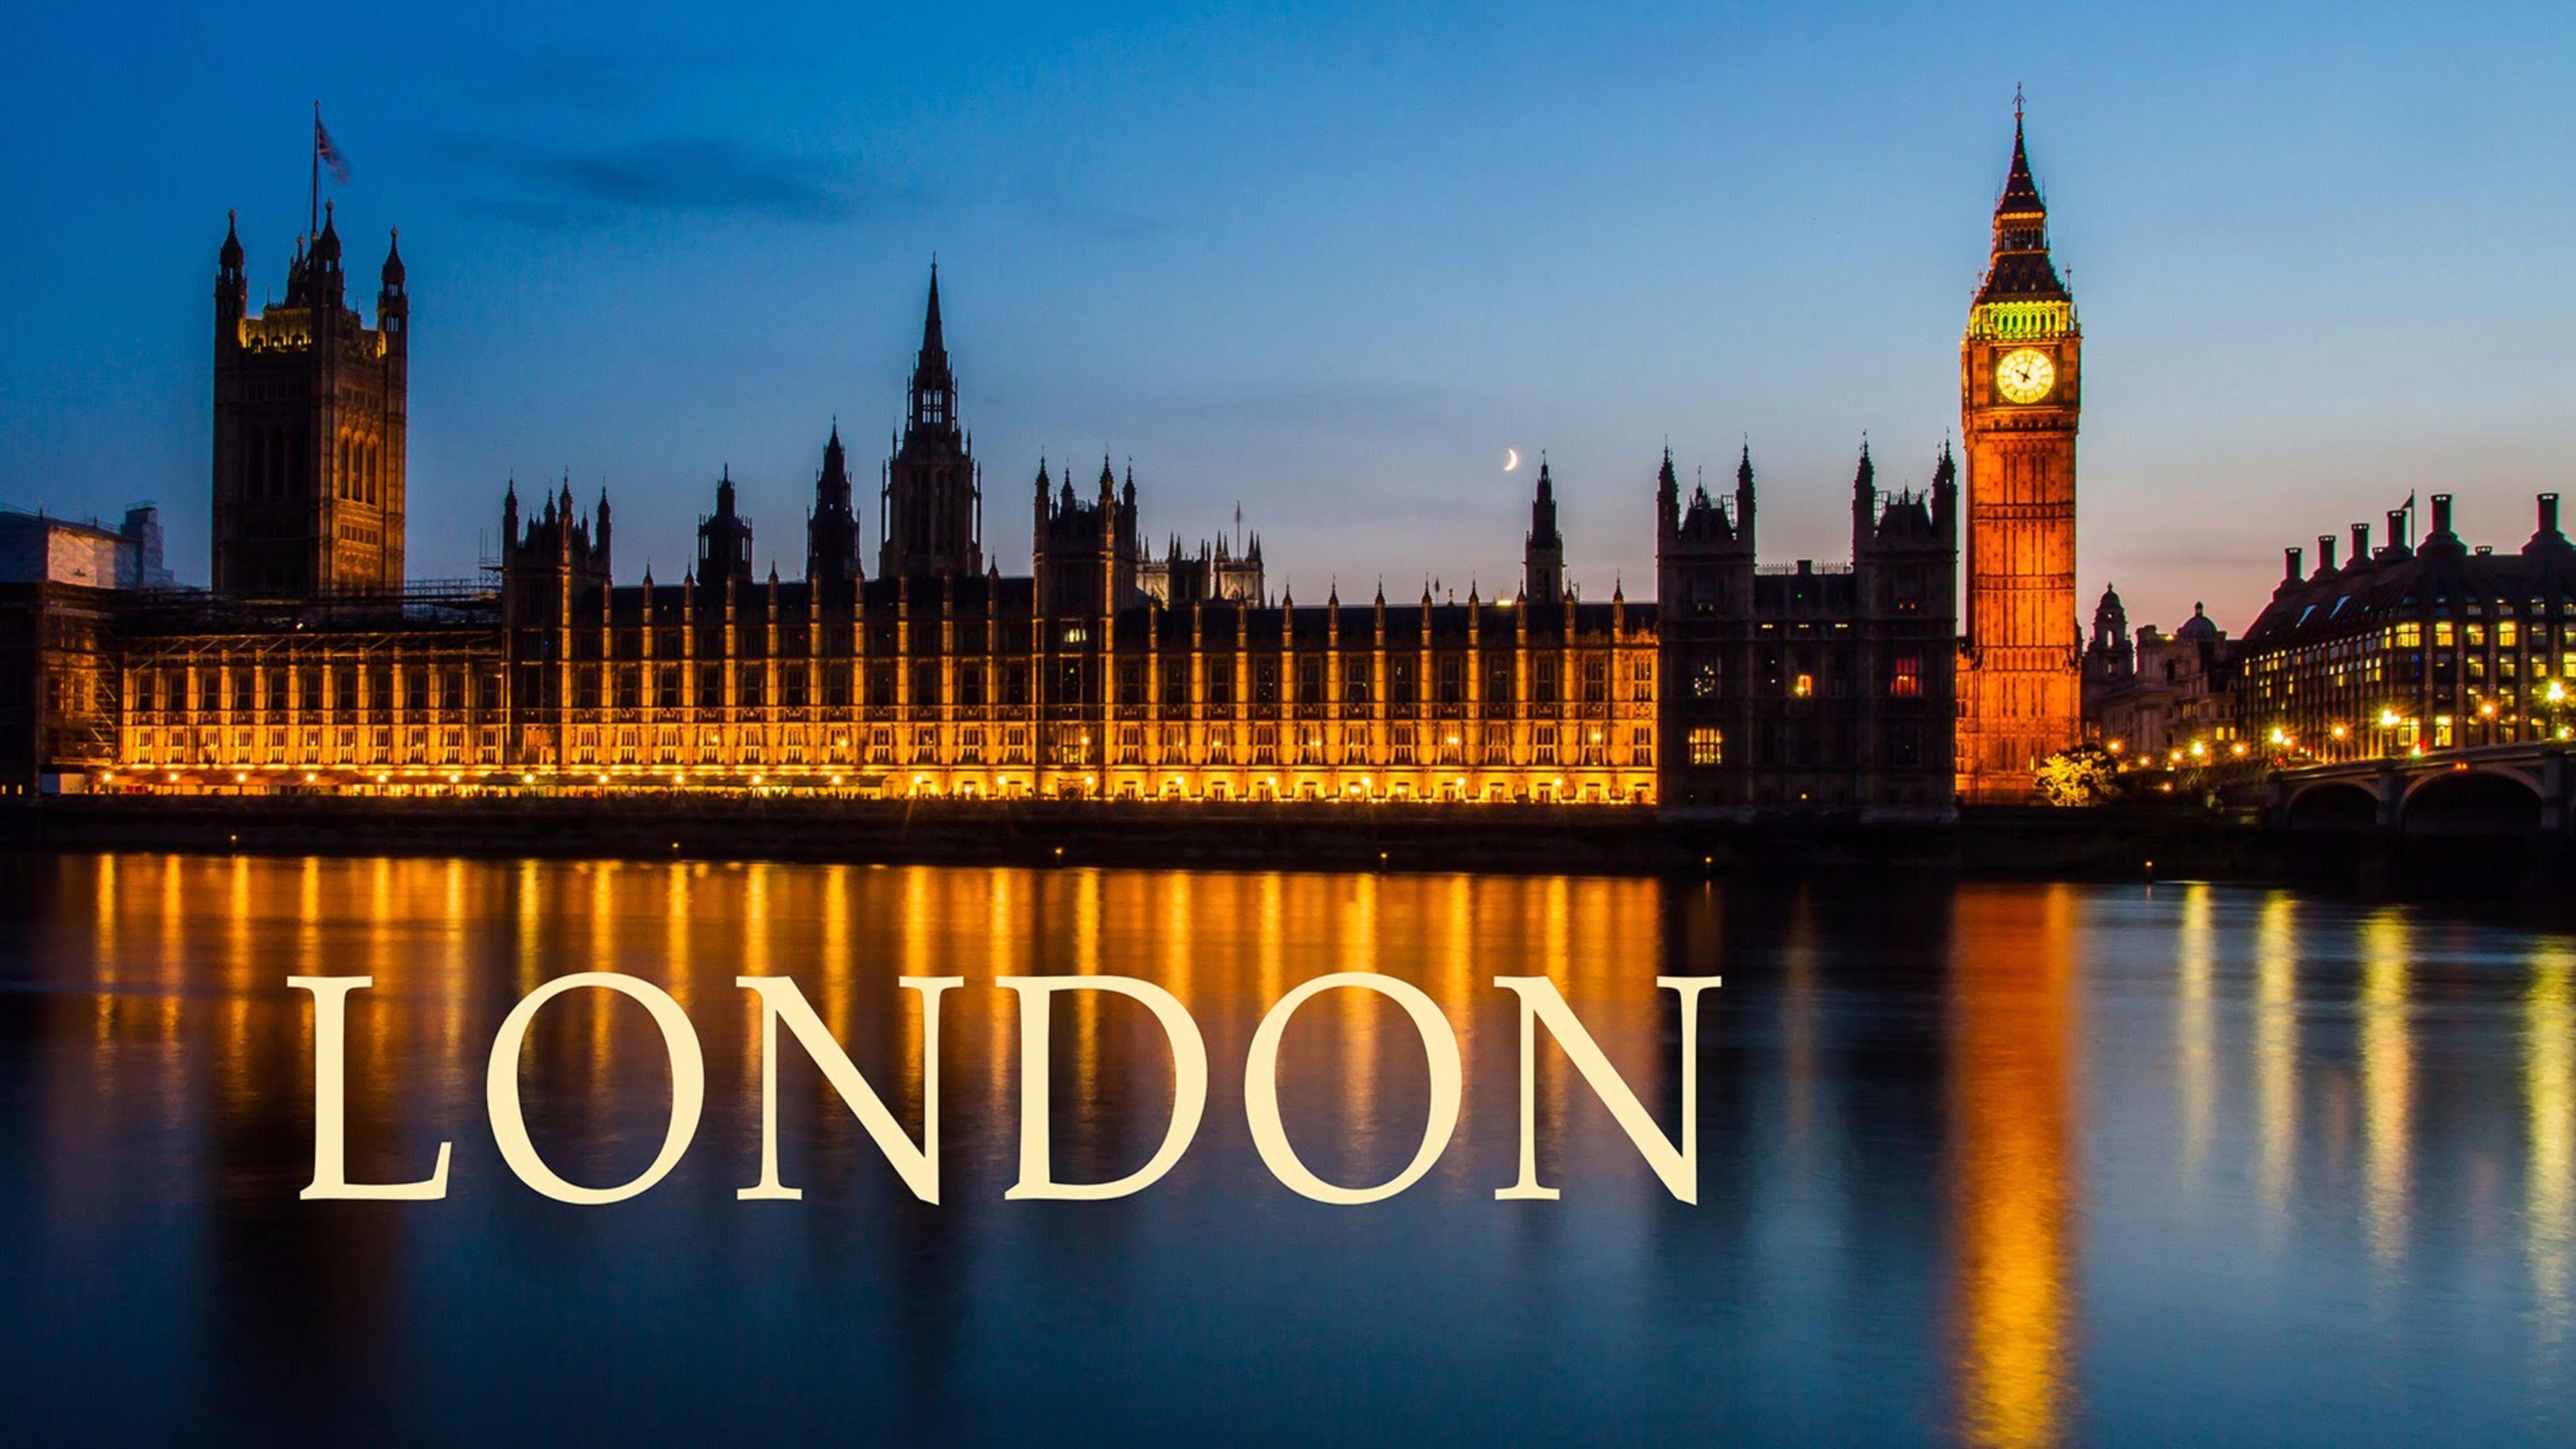 Big Ben 2016 London 4K Wallpaper 4K Wallpaper 3840x2160